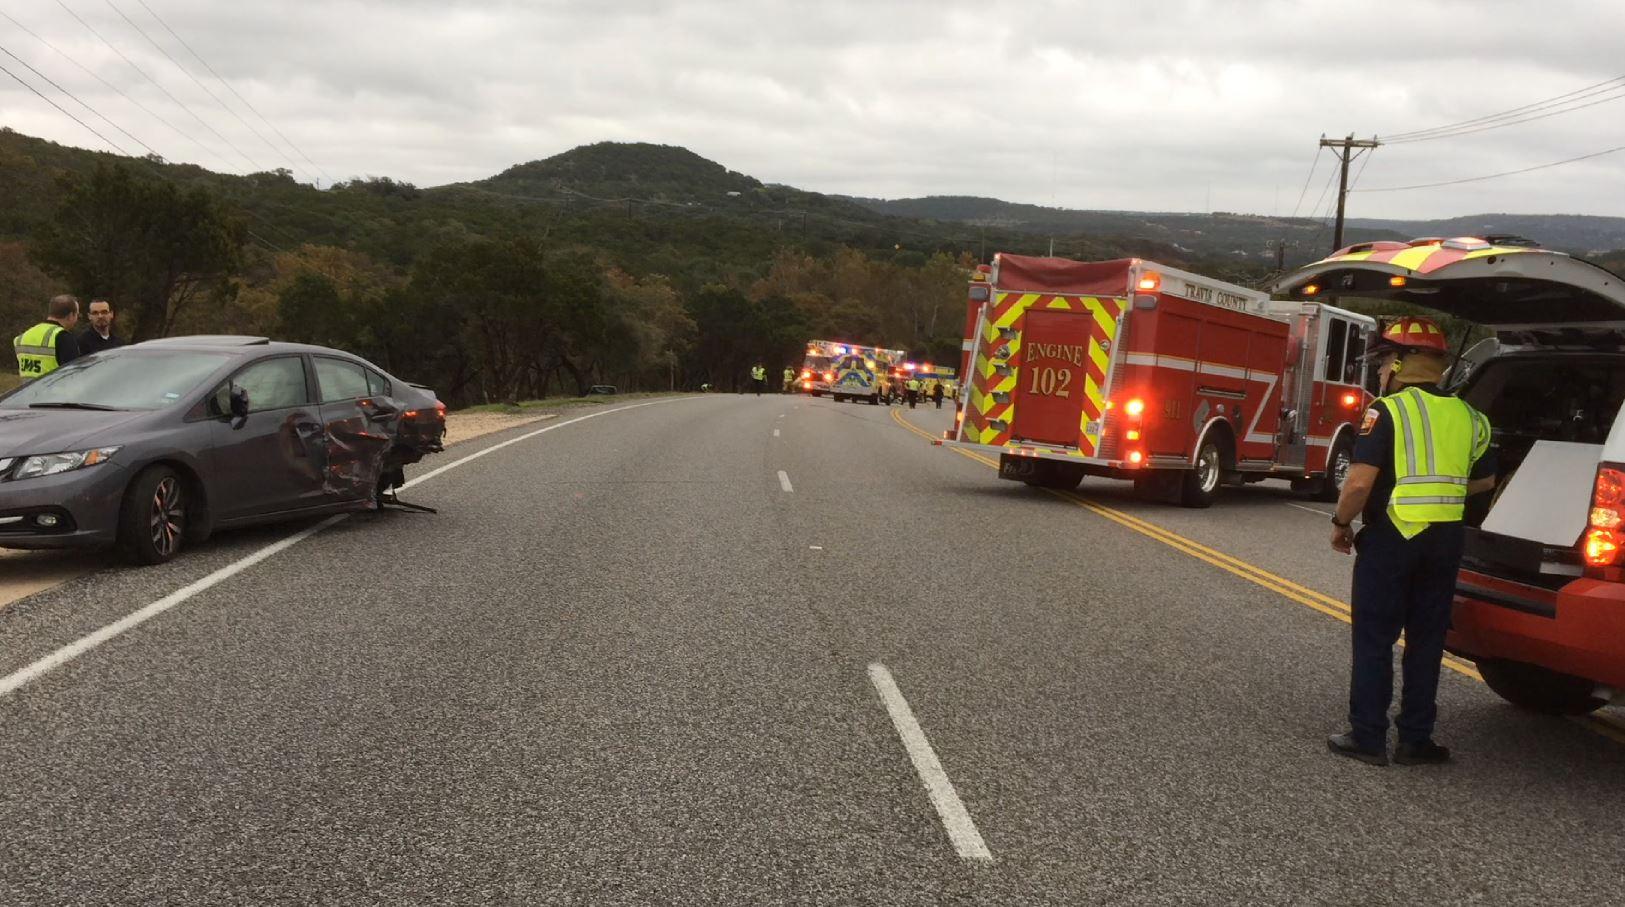 Man dies in crash on 1431 in Jonestown_377835